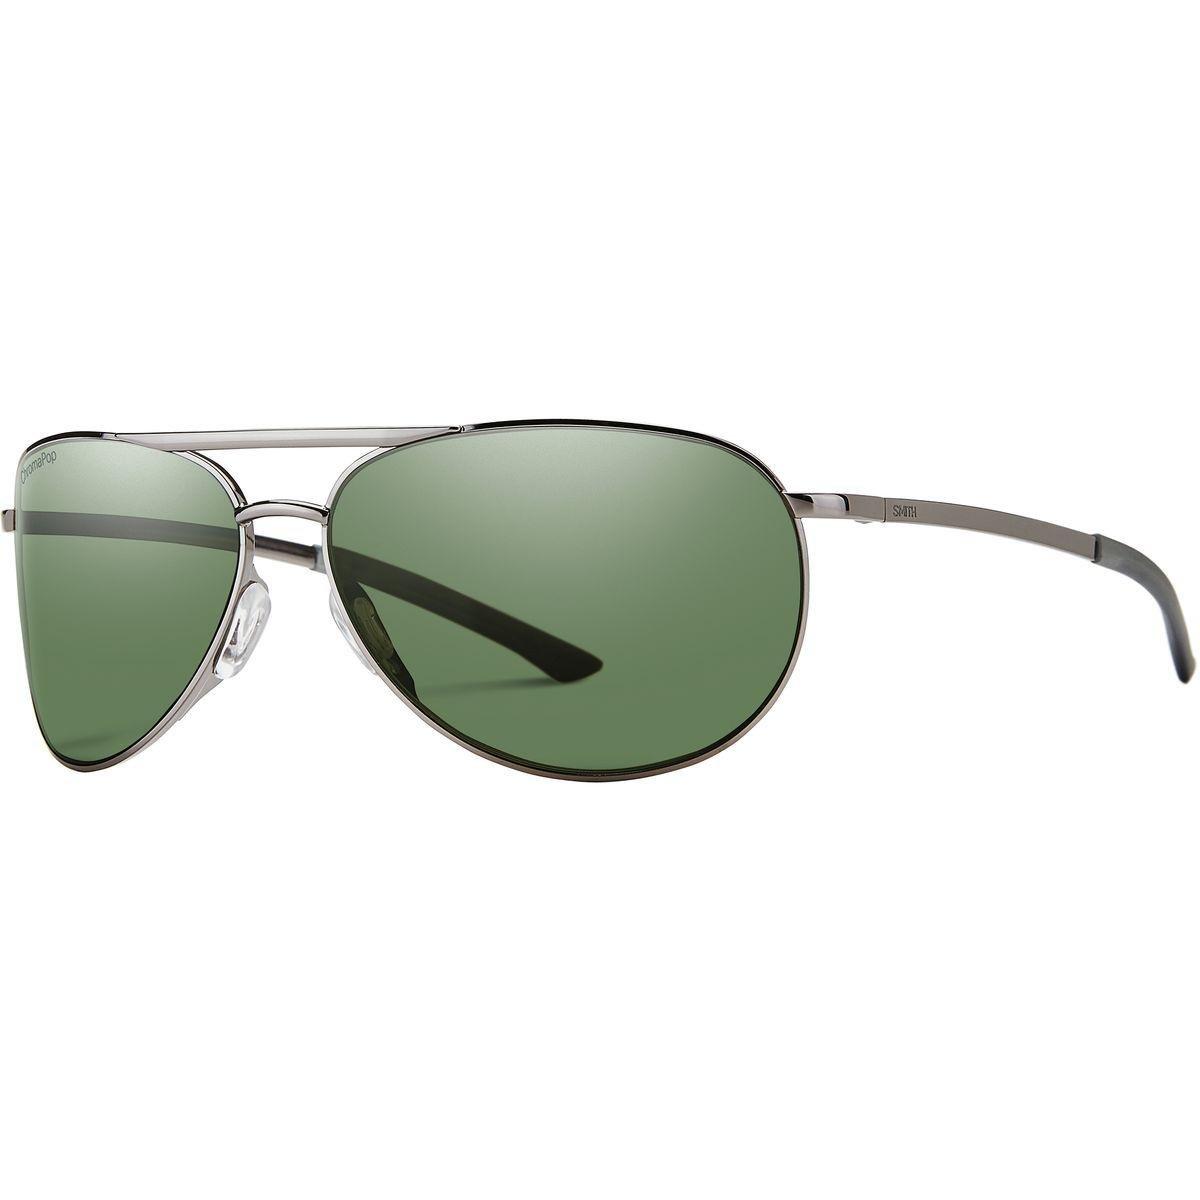 103089fb5ad11 Smith - Green Serpico 2 Polarized Sunglasses for Men - Lyst. View fullscreen